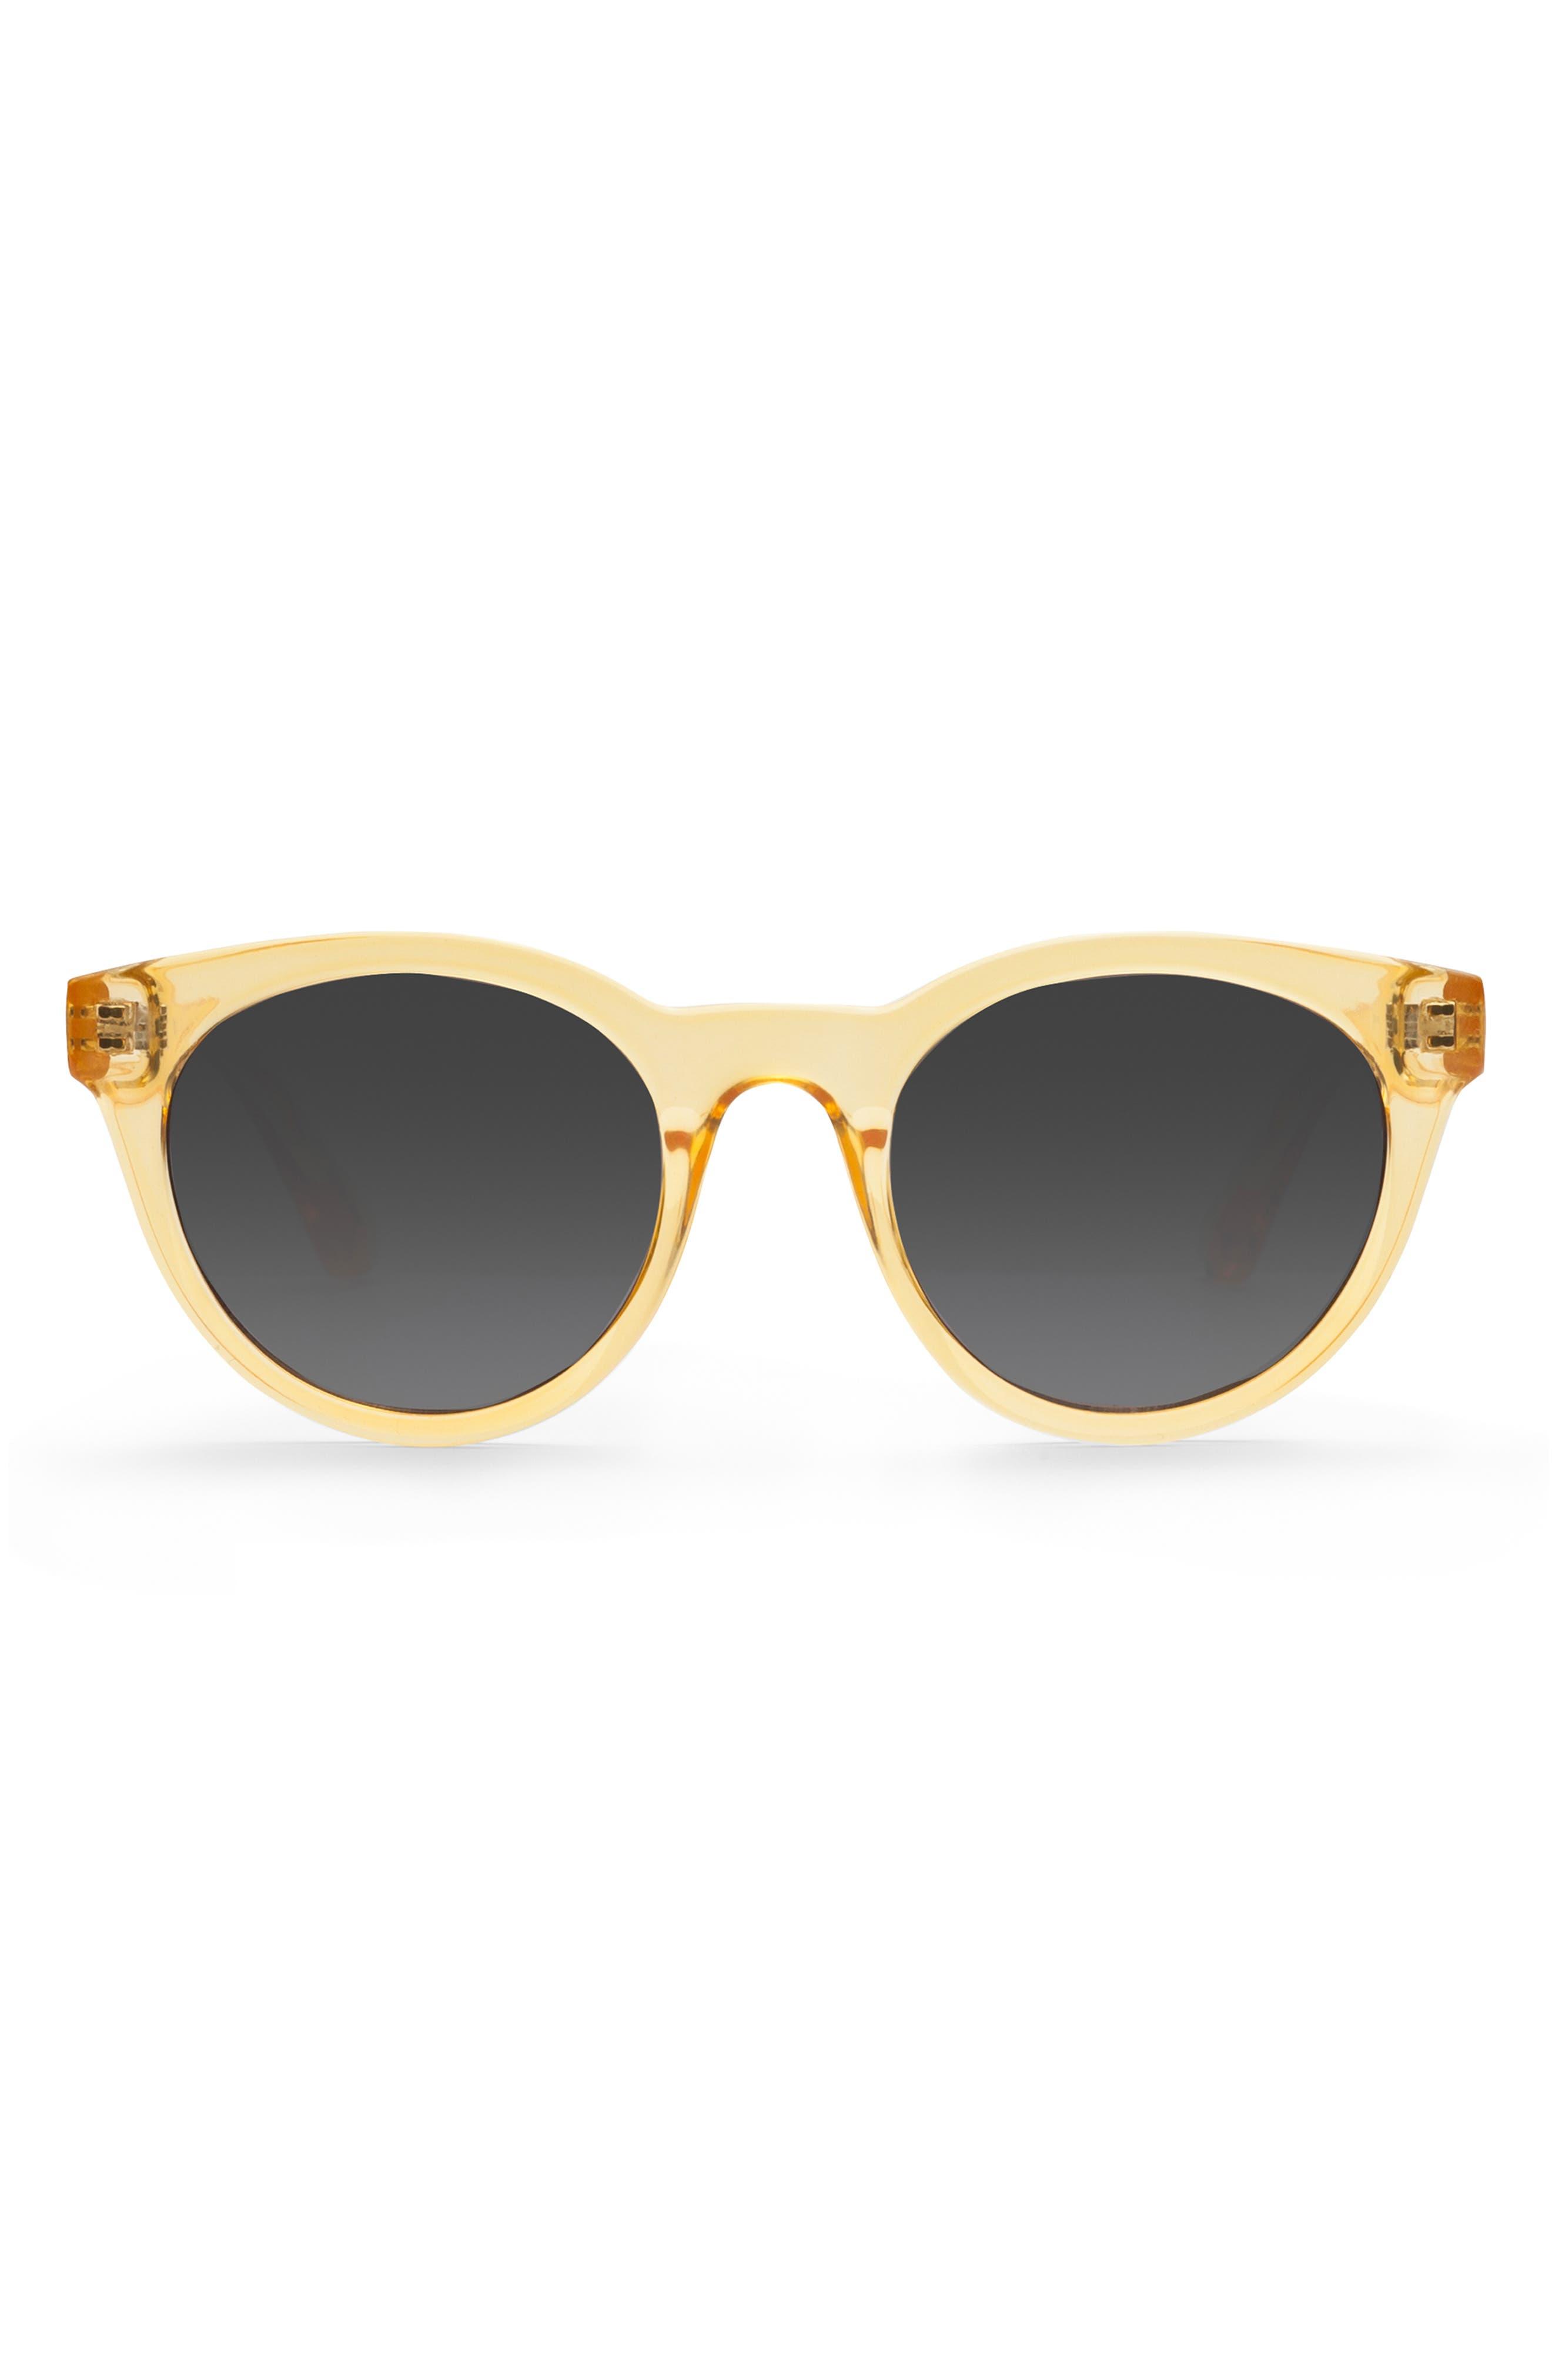 Junia Fizz Preppy 4m Round Sunglasses - Crystal Yellow